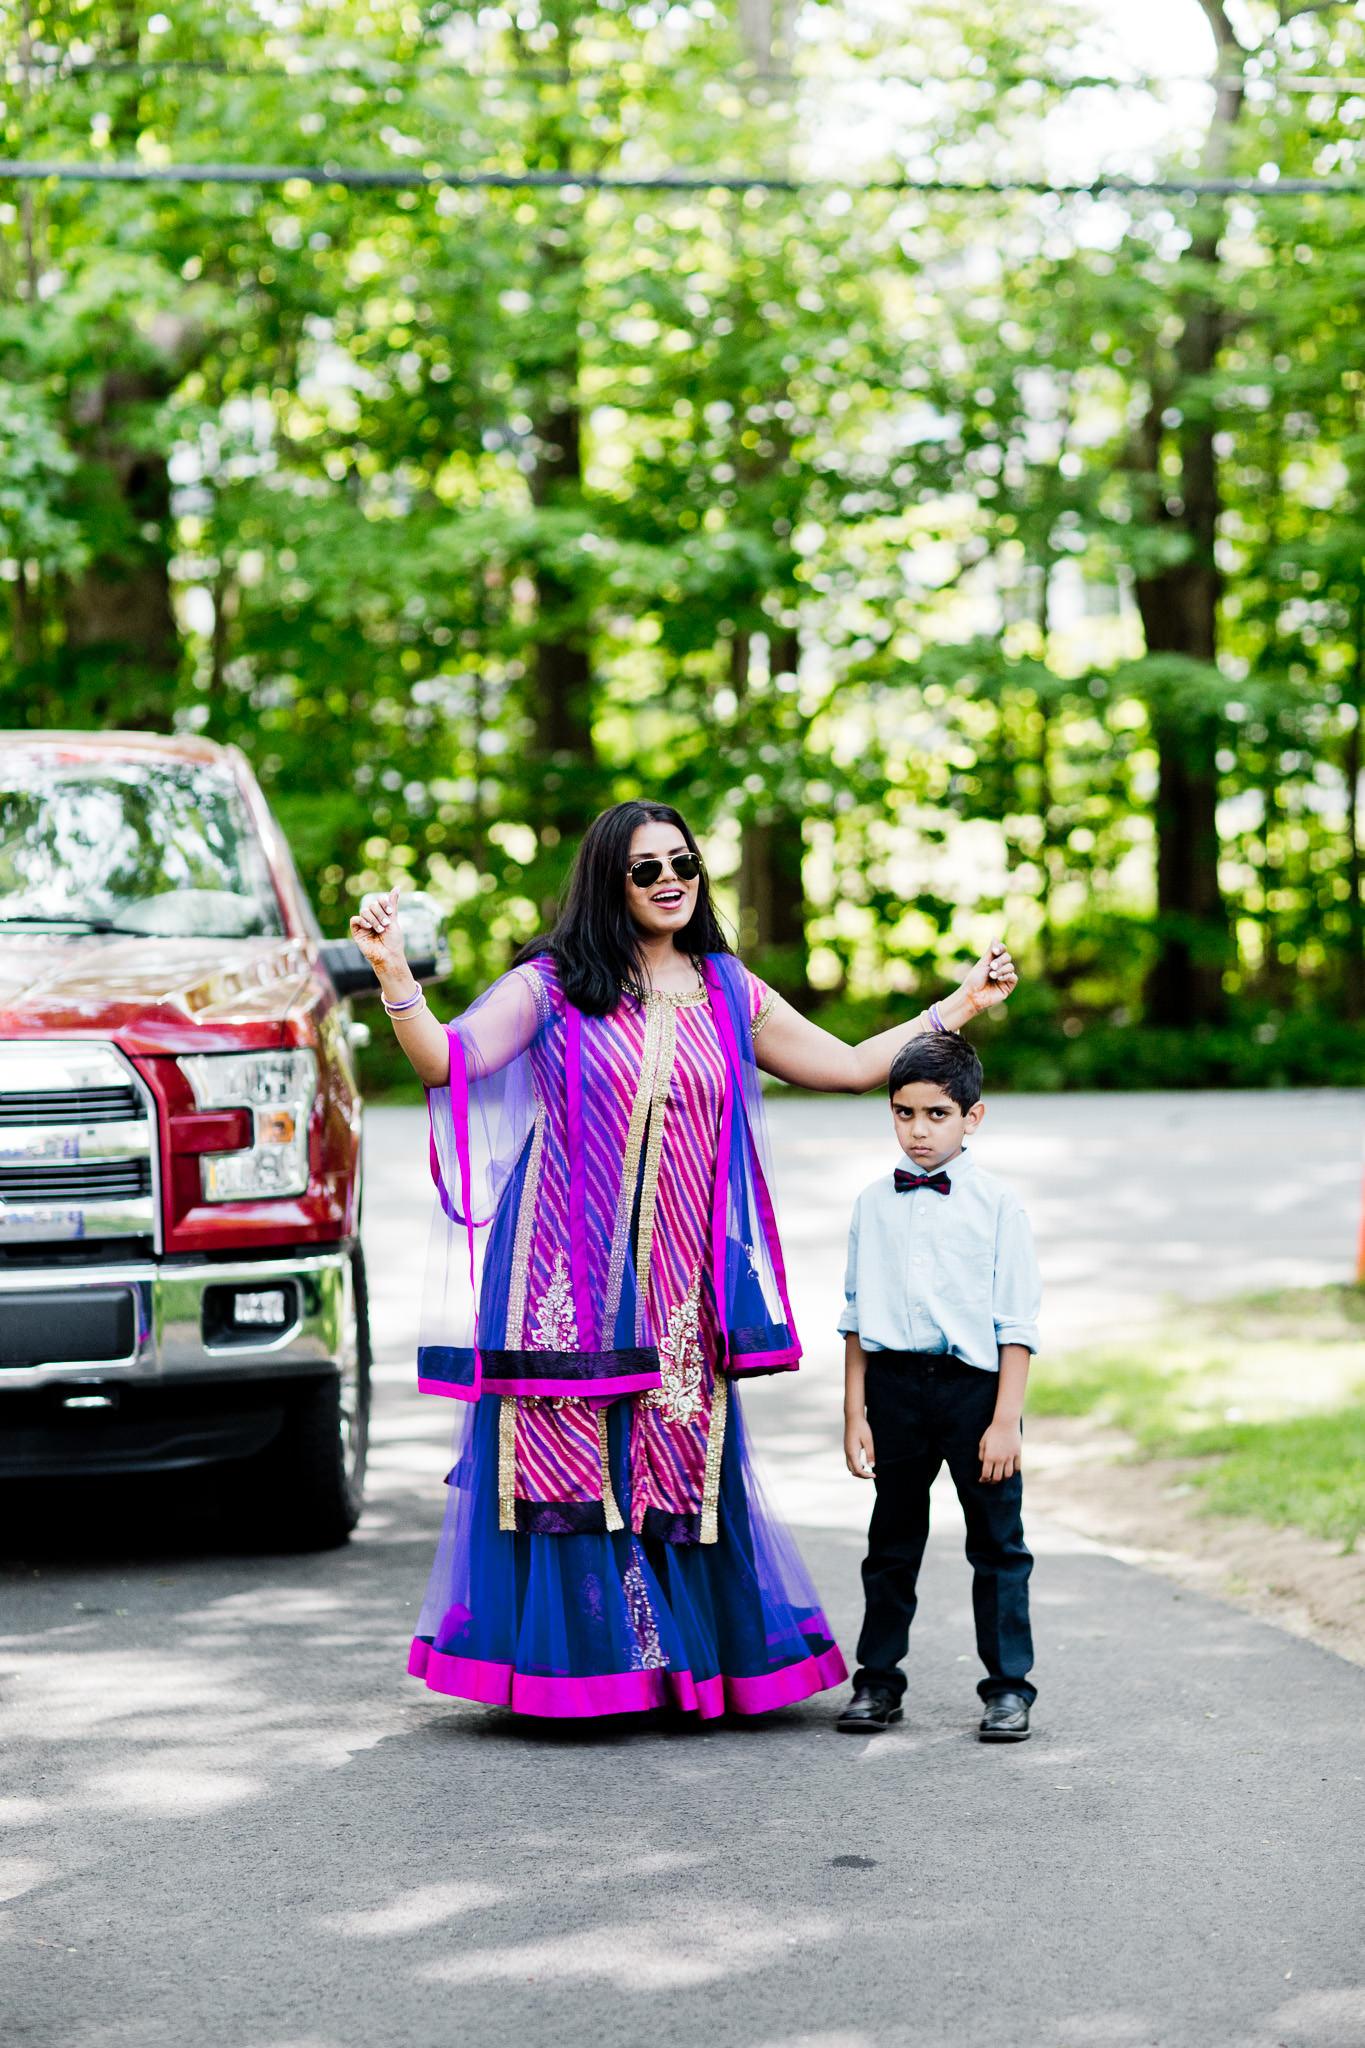 031_Canada-documentary-wedding-photograp